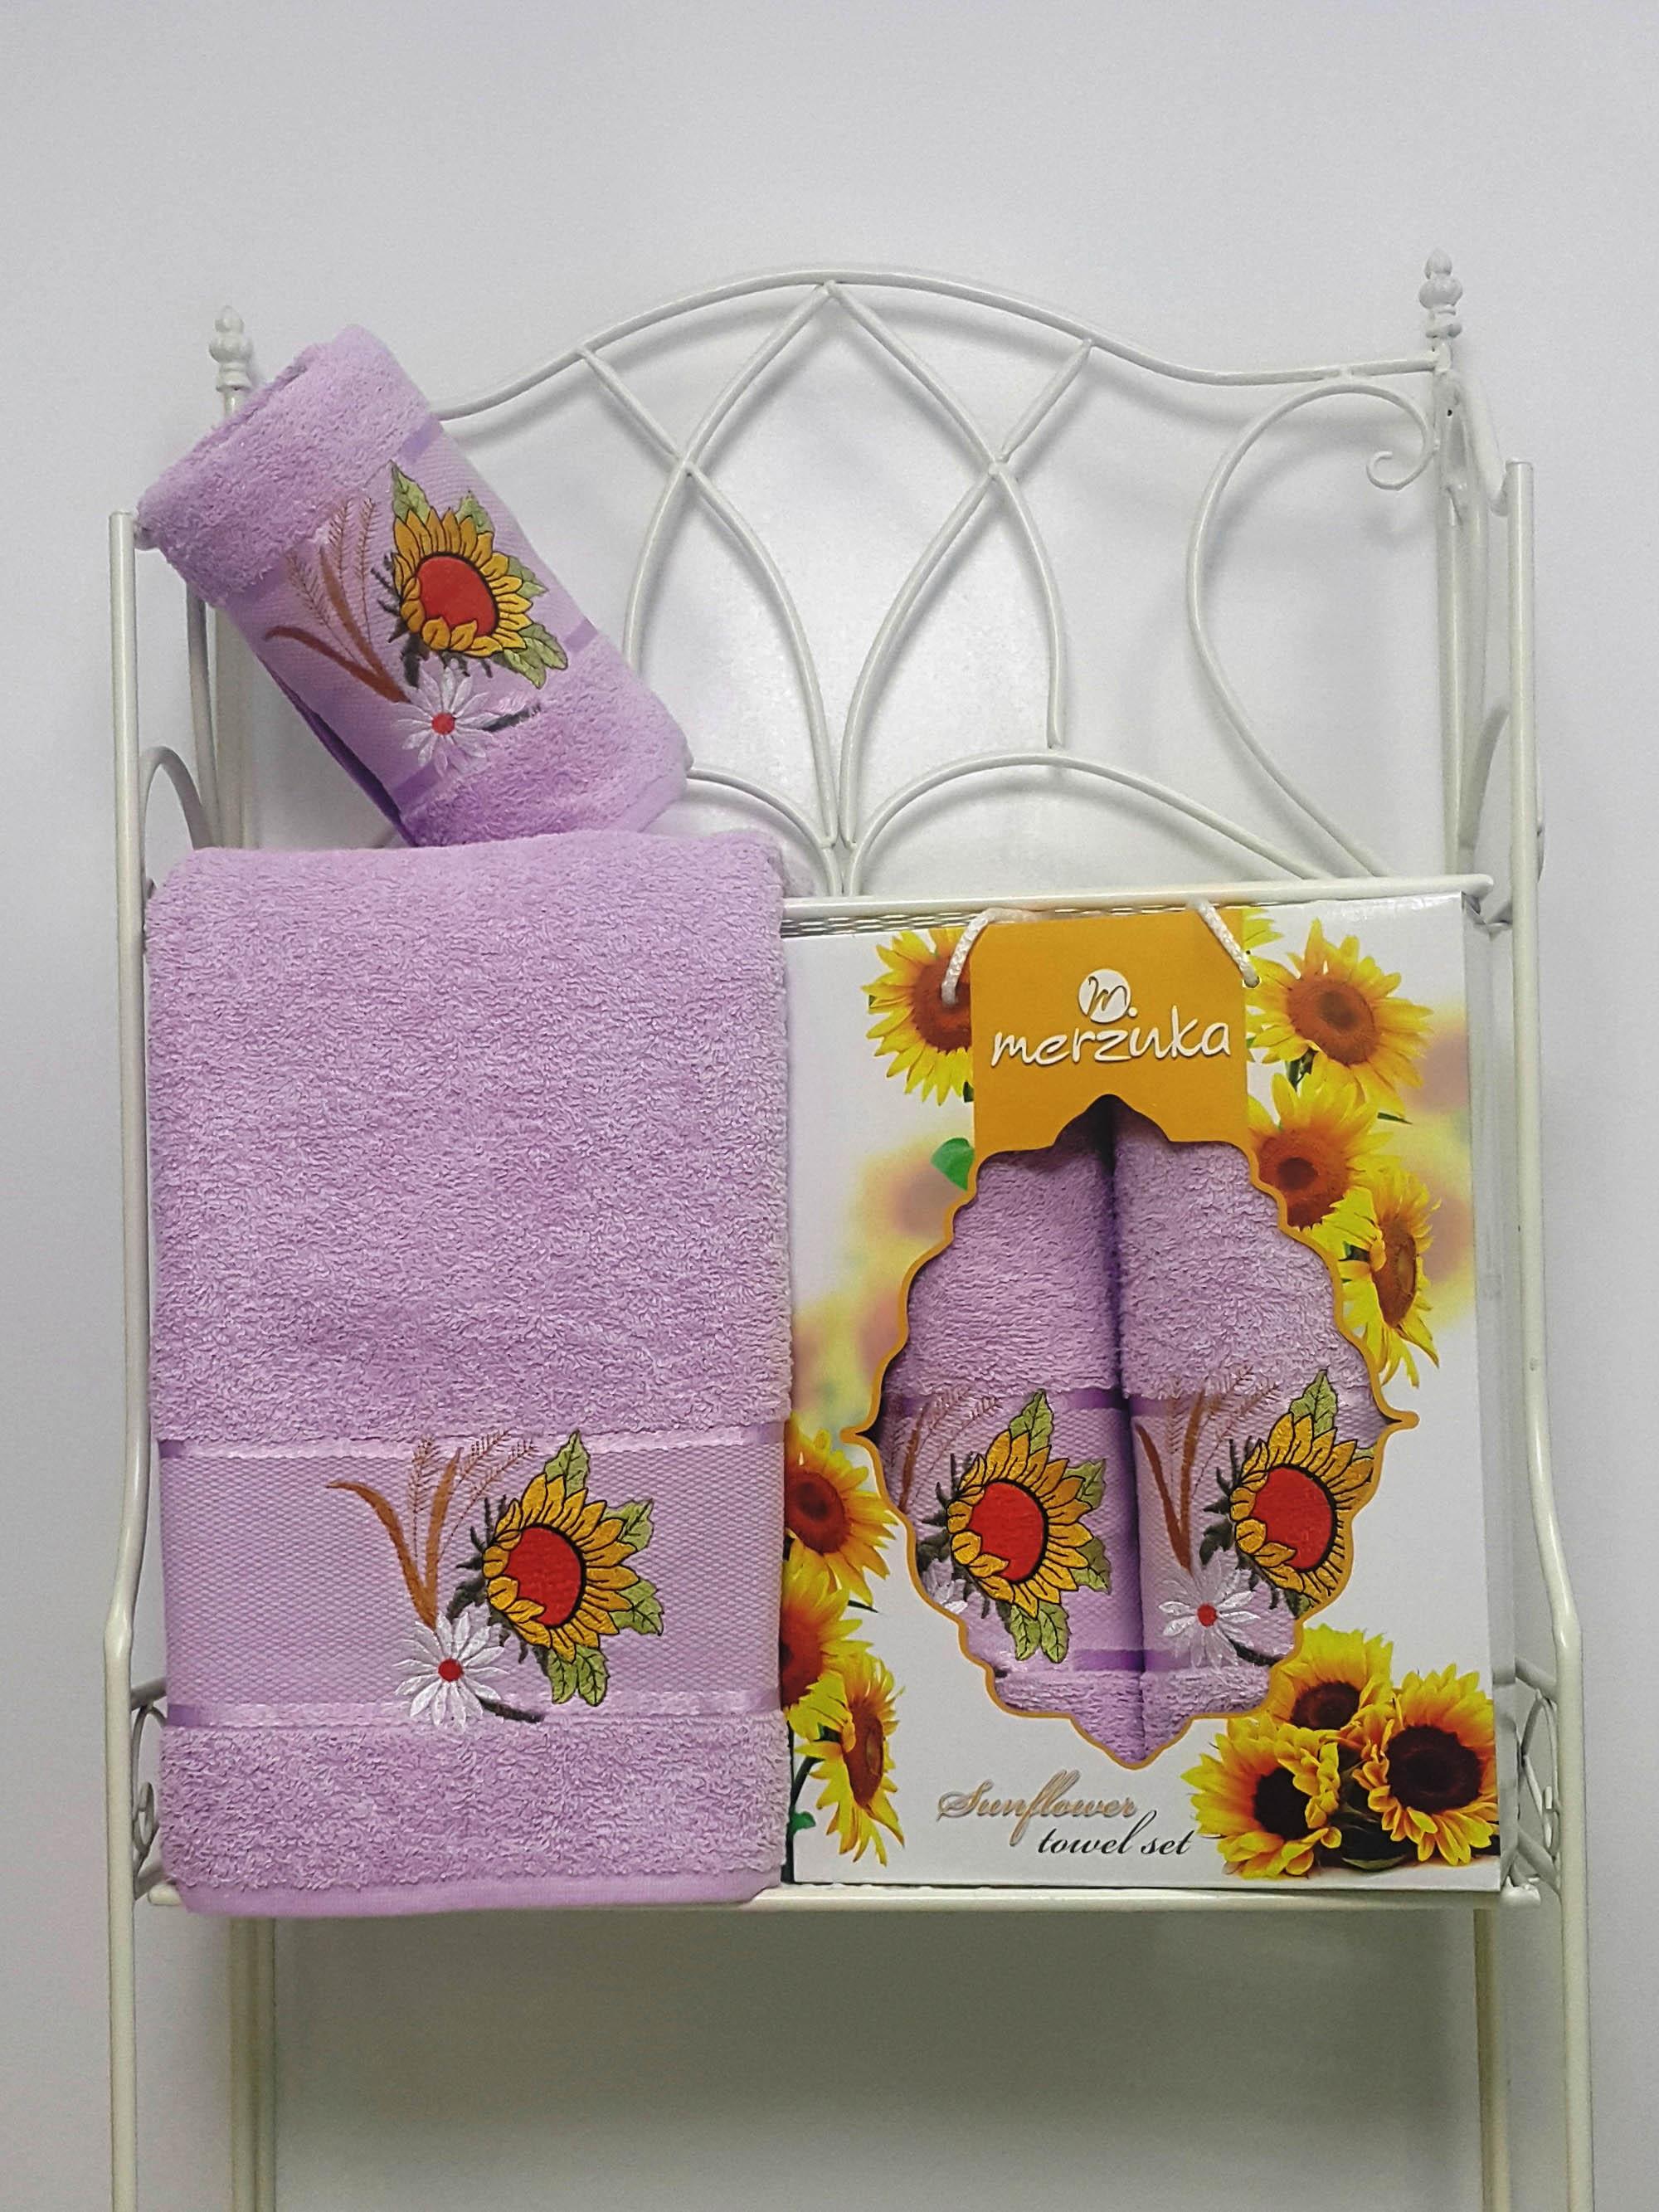 Полотенца Oran Merzuka Набор из 2 полотенец Sunflower Цвет: Сиреневый набор из 3 полотенец merzuka sakura 50х90 2 70х140 8432 оранжевый